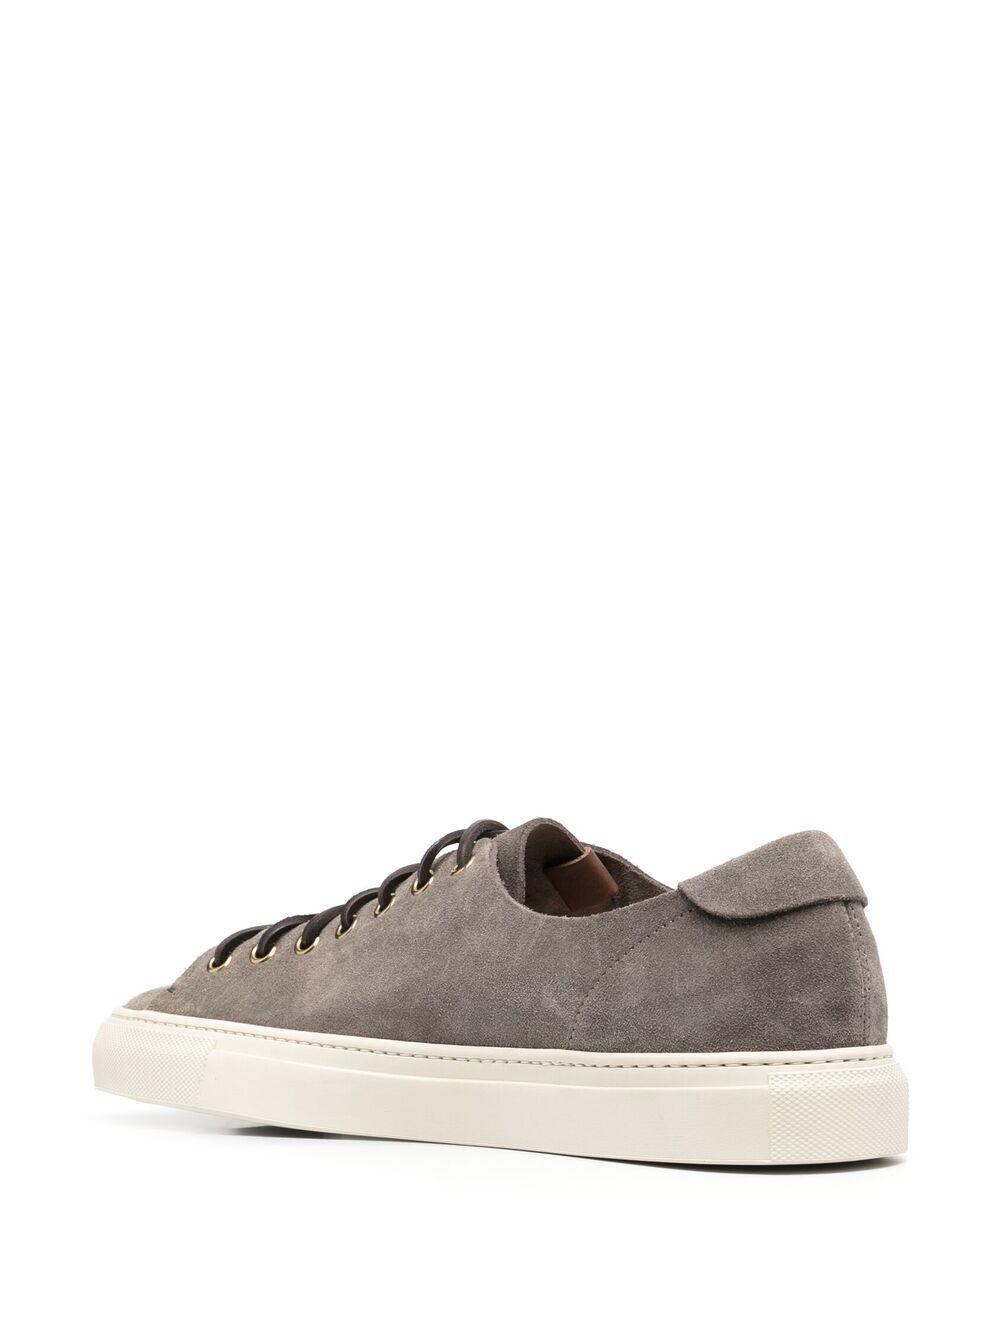 Low top suede sneakers man BUTTERO | Sneakers | B4020GORH-UGTAUPE